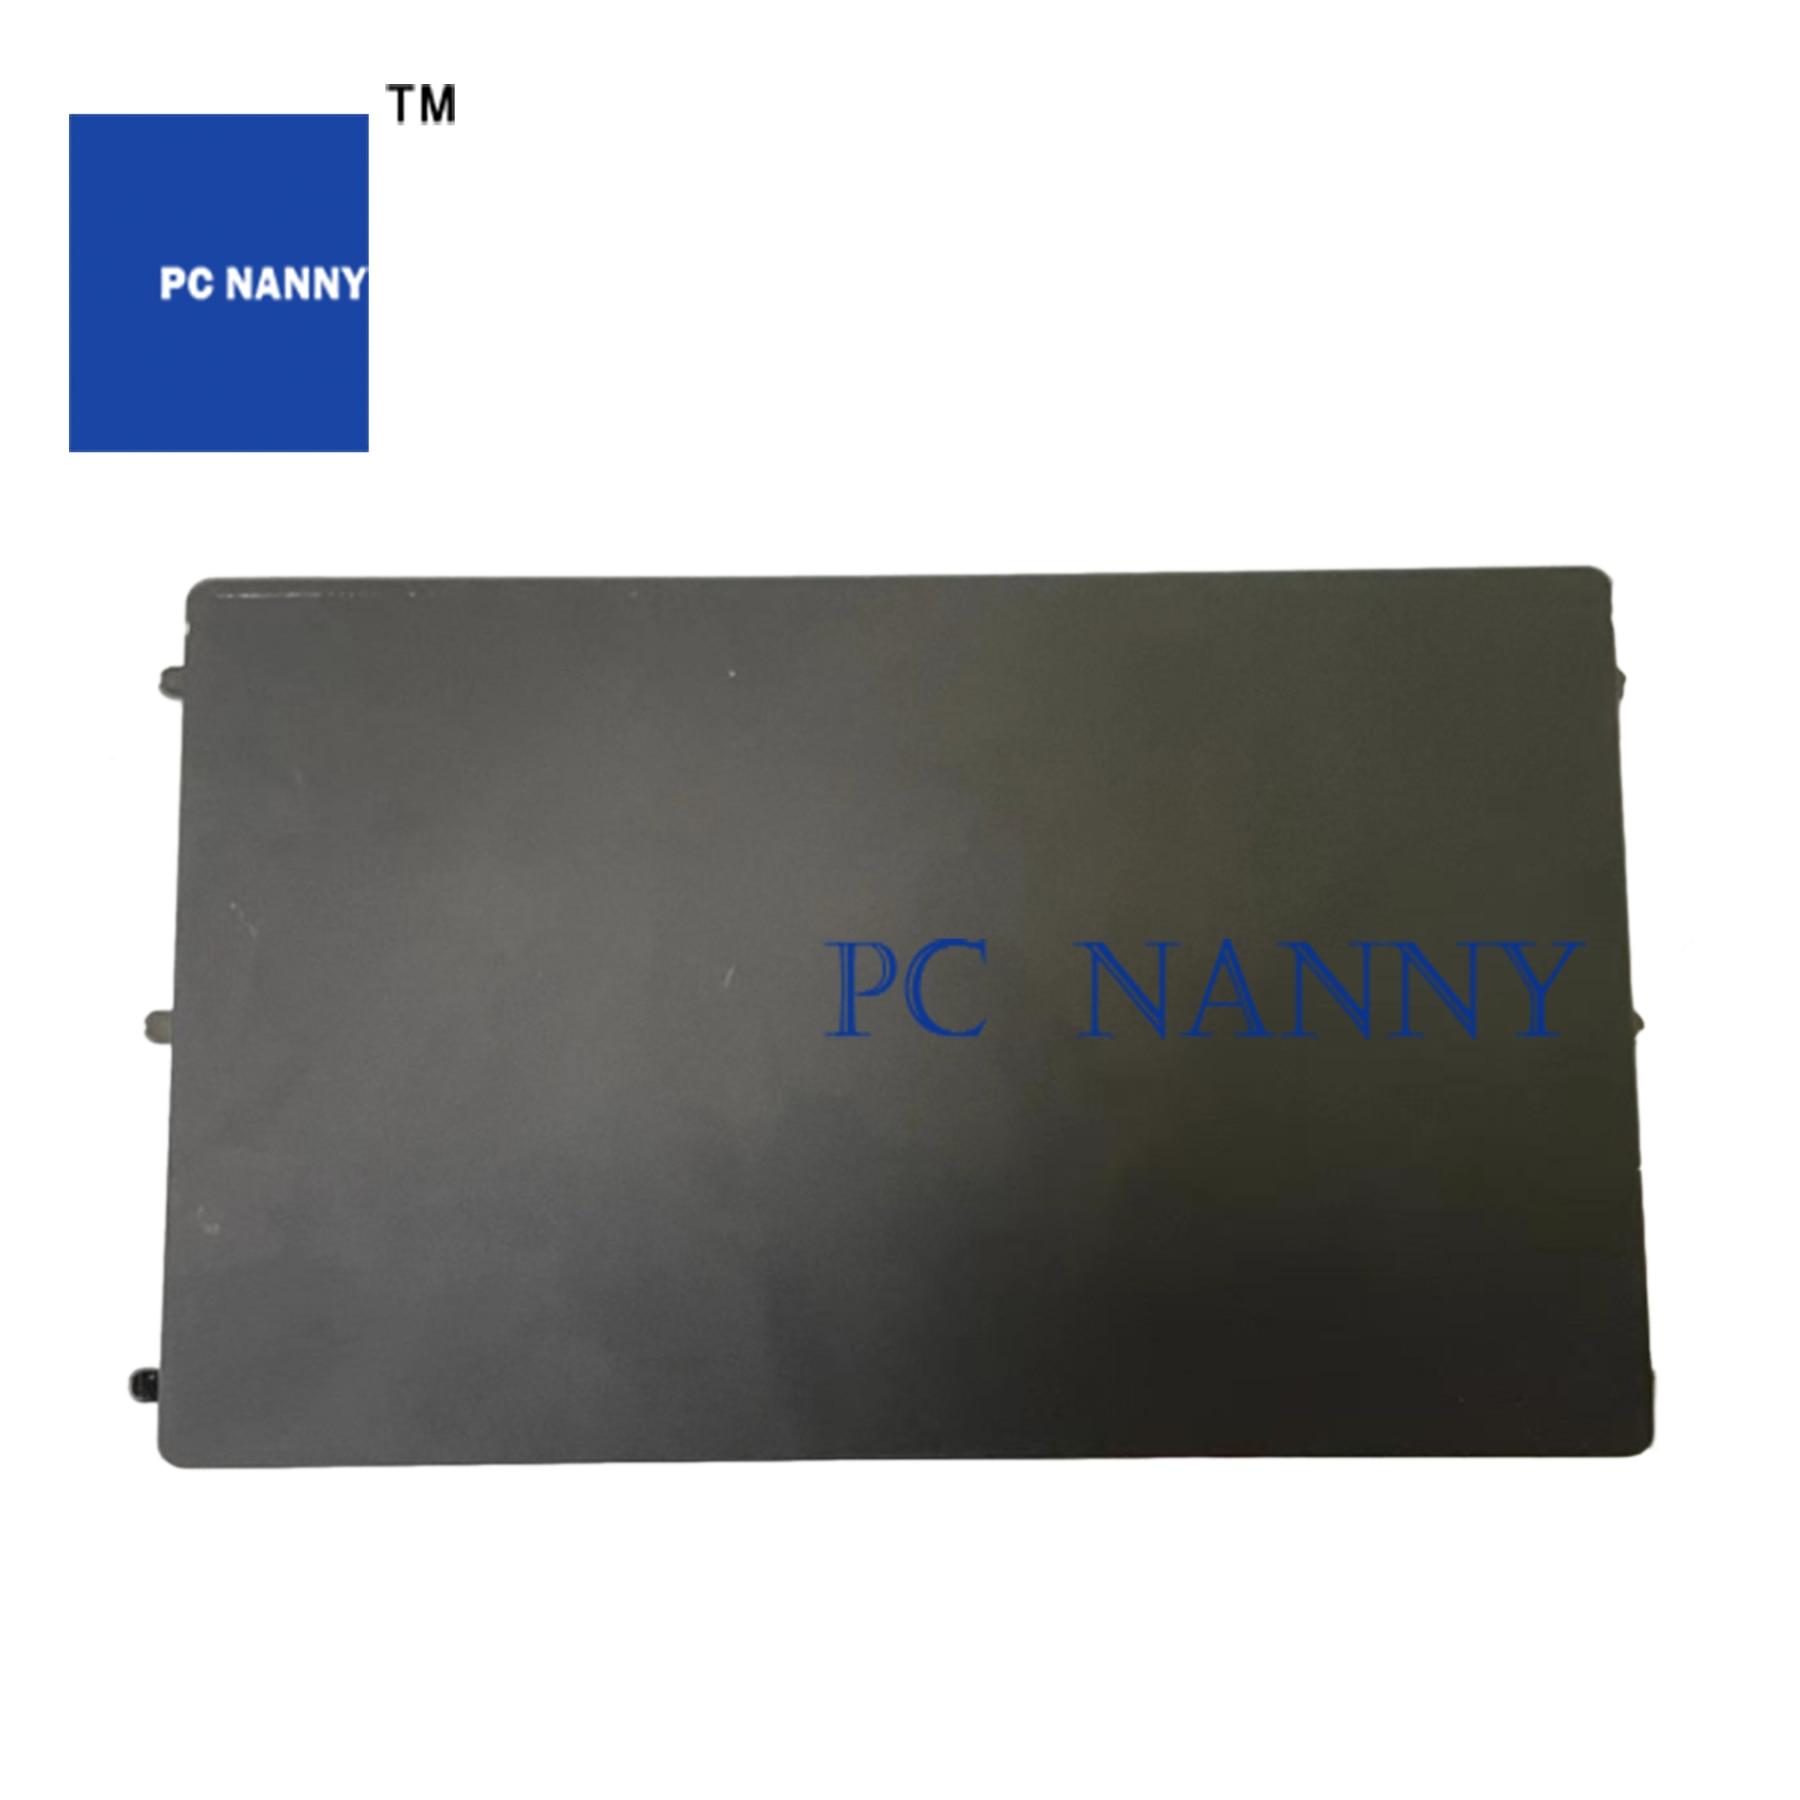 PCNANNY ل Razer15 17 RZ09-0238 اللمس